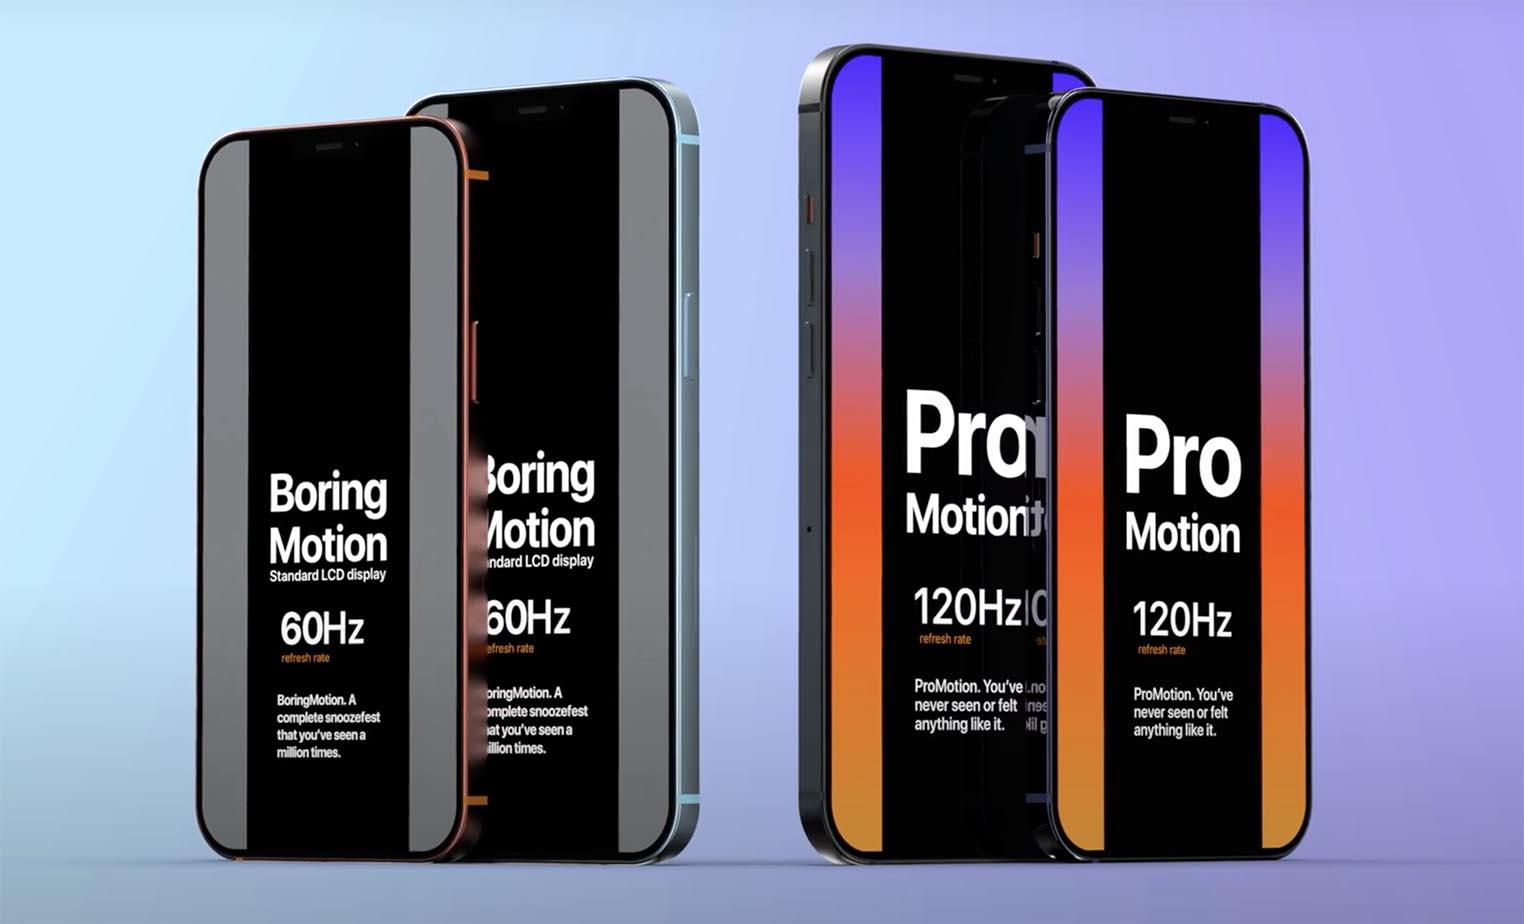 iPhone 13 Boring Motion ProMotion